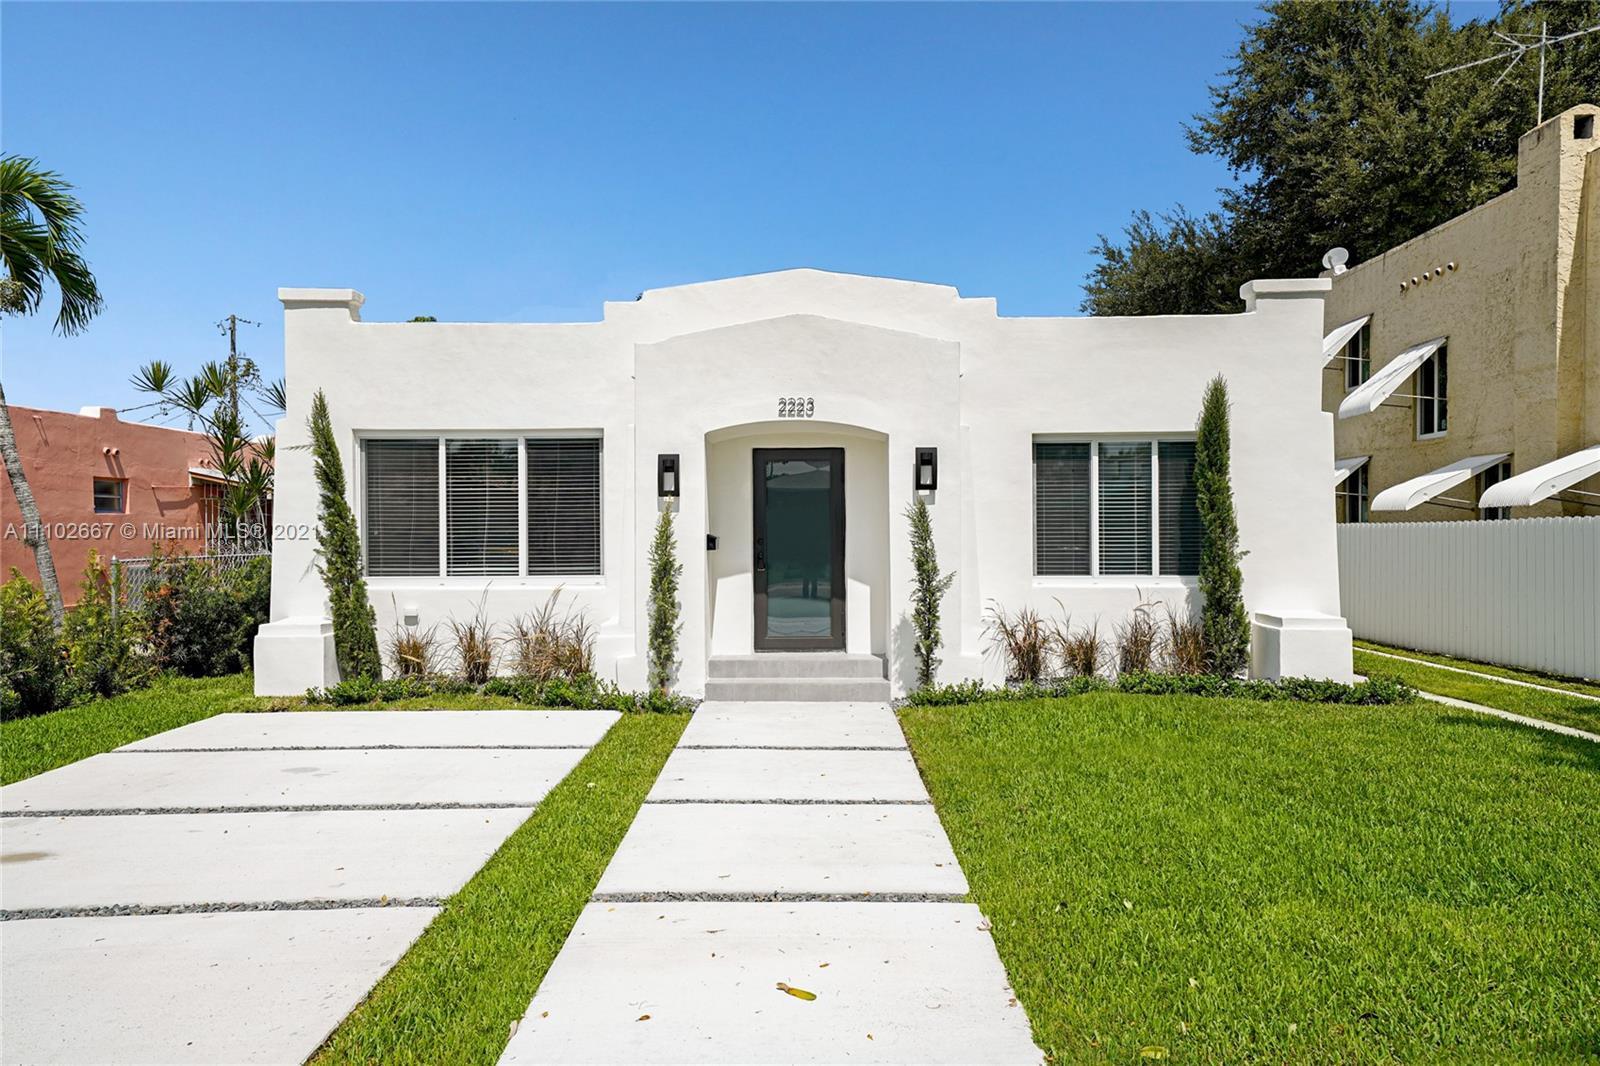 Single Family Home For Sale BRYAN PARK1,558 Sqft